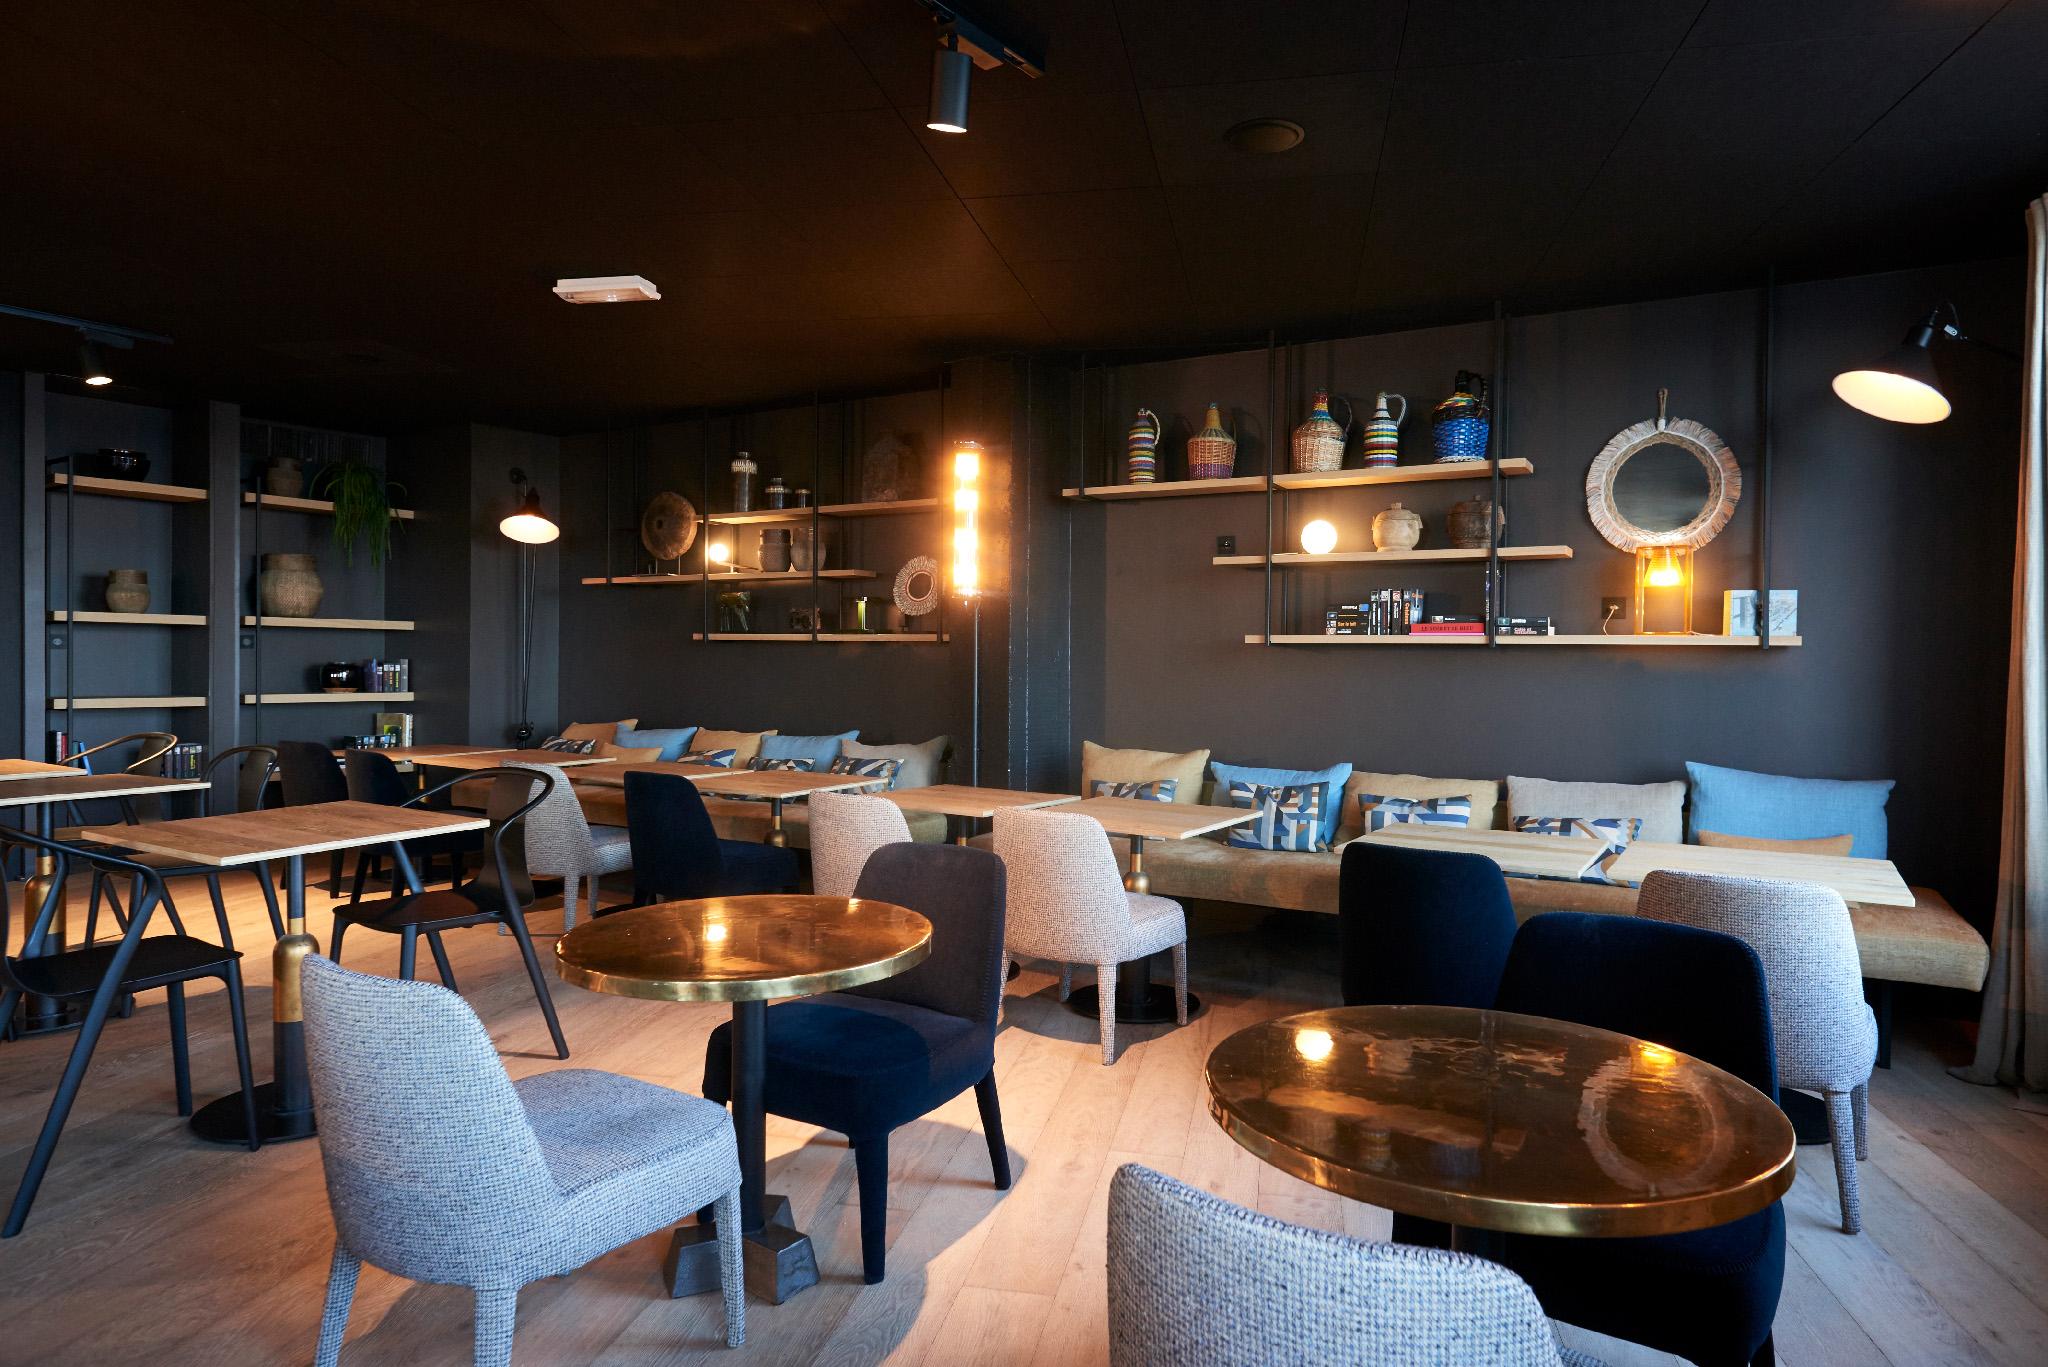 96_photographie_hotel_restaurant_nantes